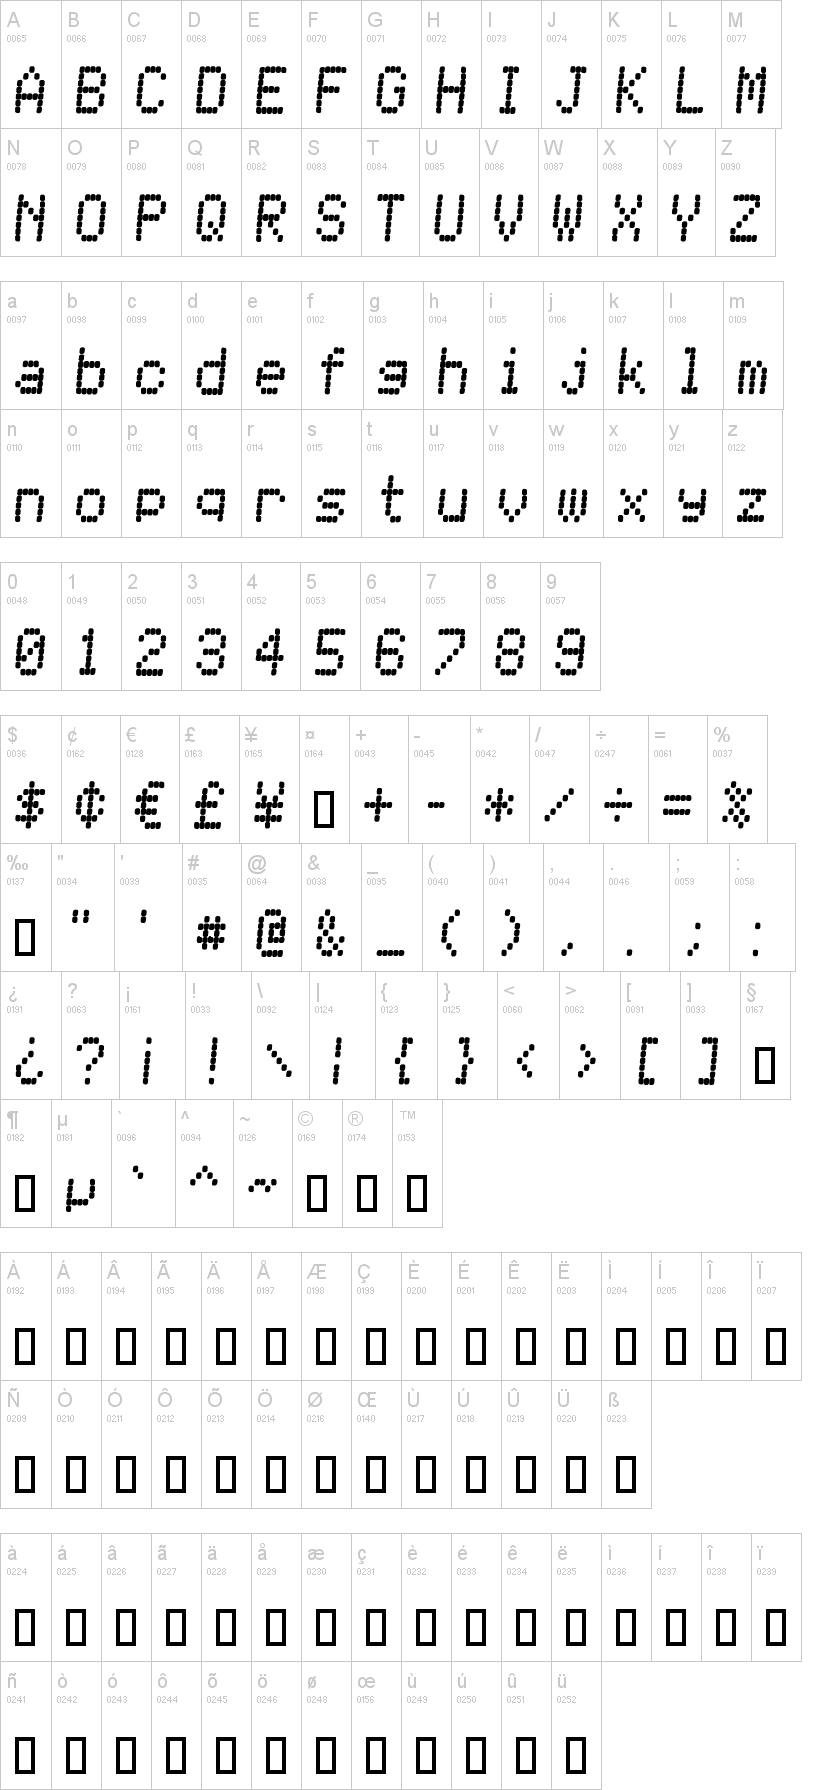 Receiptional Receipt Font | dafont com